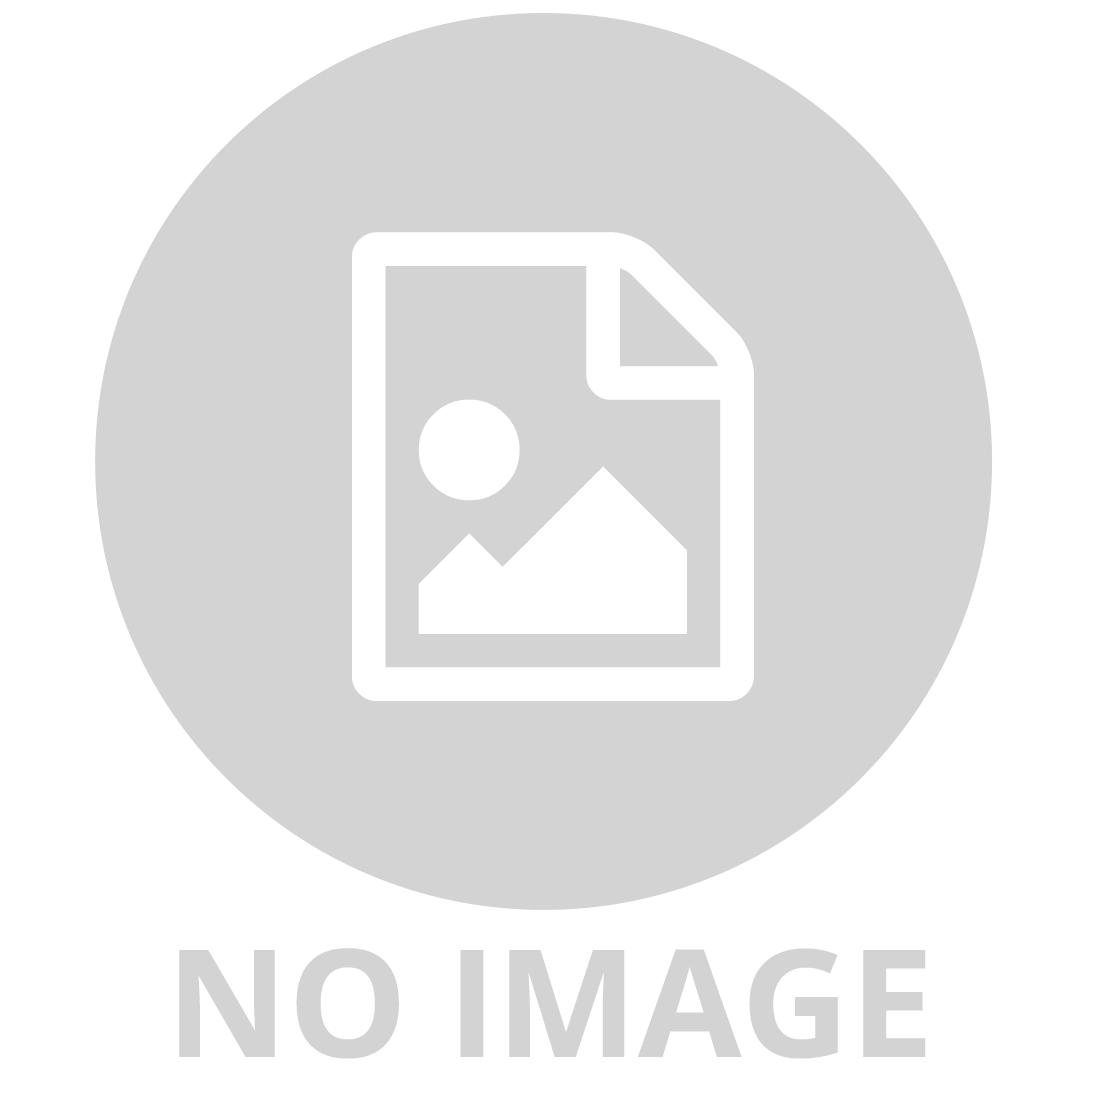 REVELL 1:72 GERMAN NAVY CREW WW2